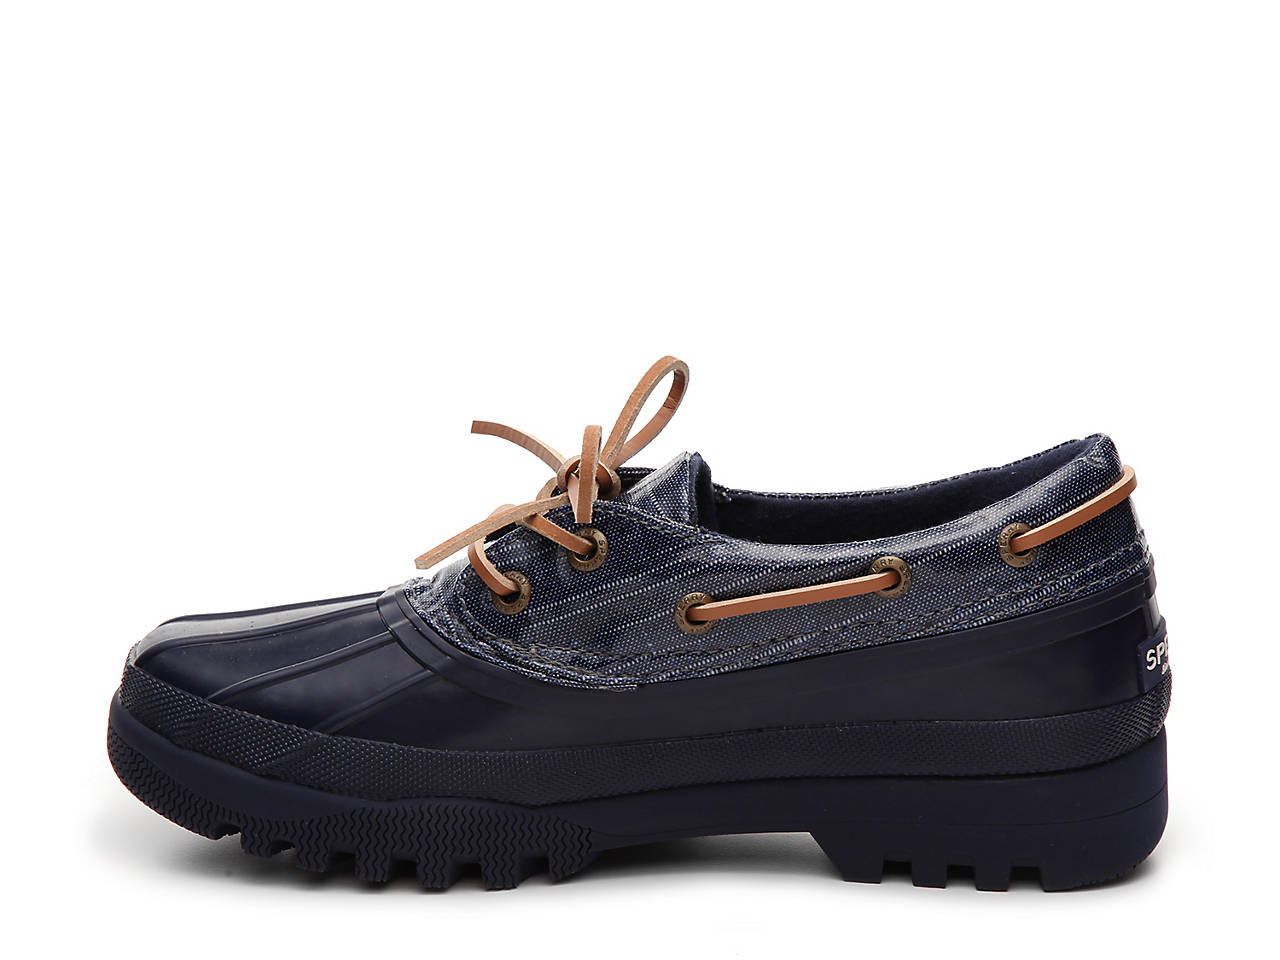 Sperry Top Sider Heron Rain Shoe